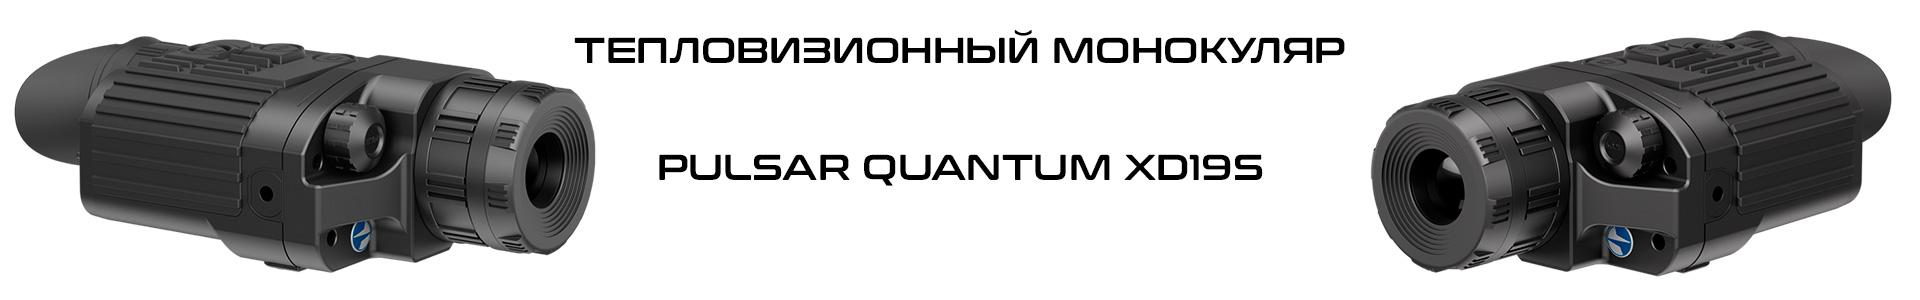 Купить тепловизор Pulsar Quantum XD19S